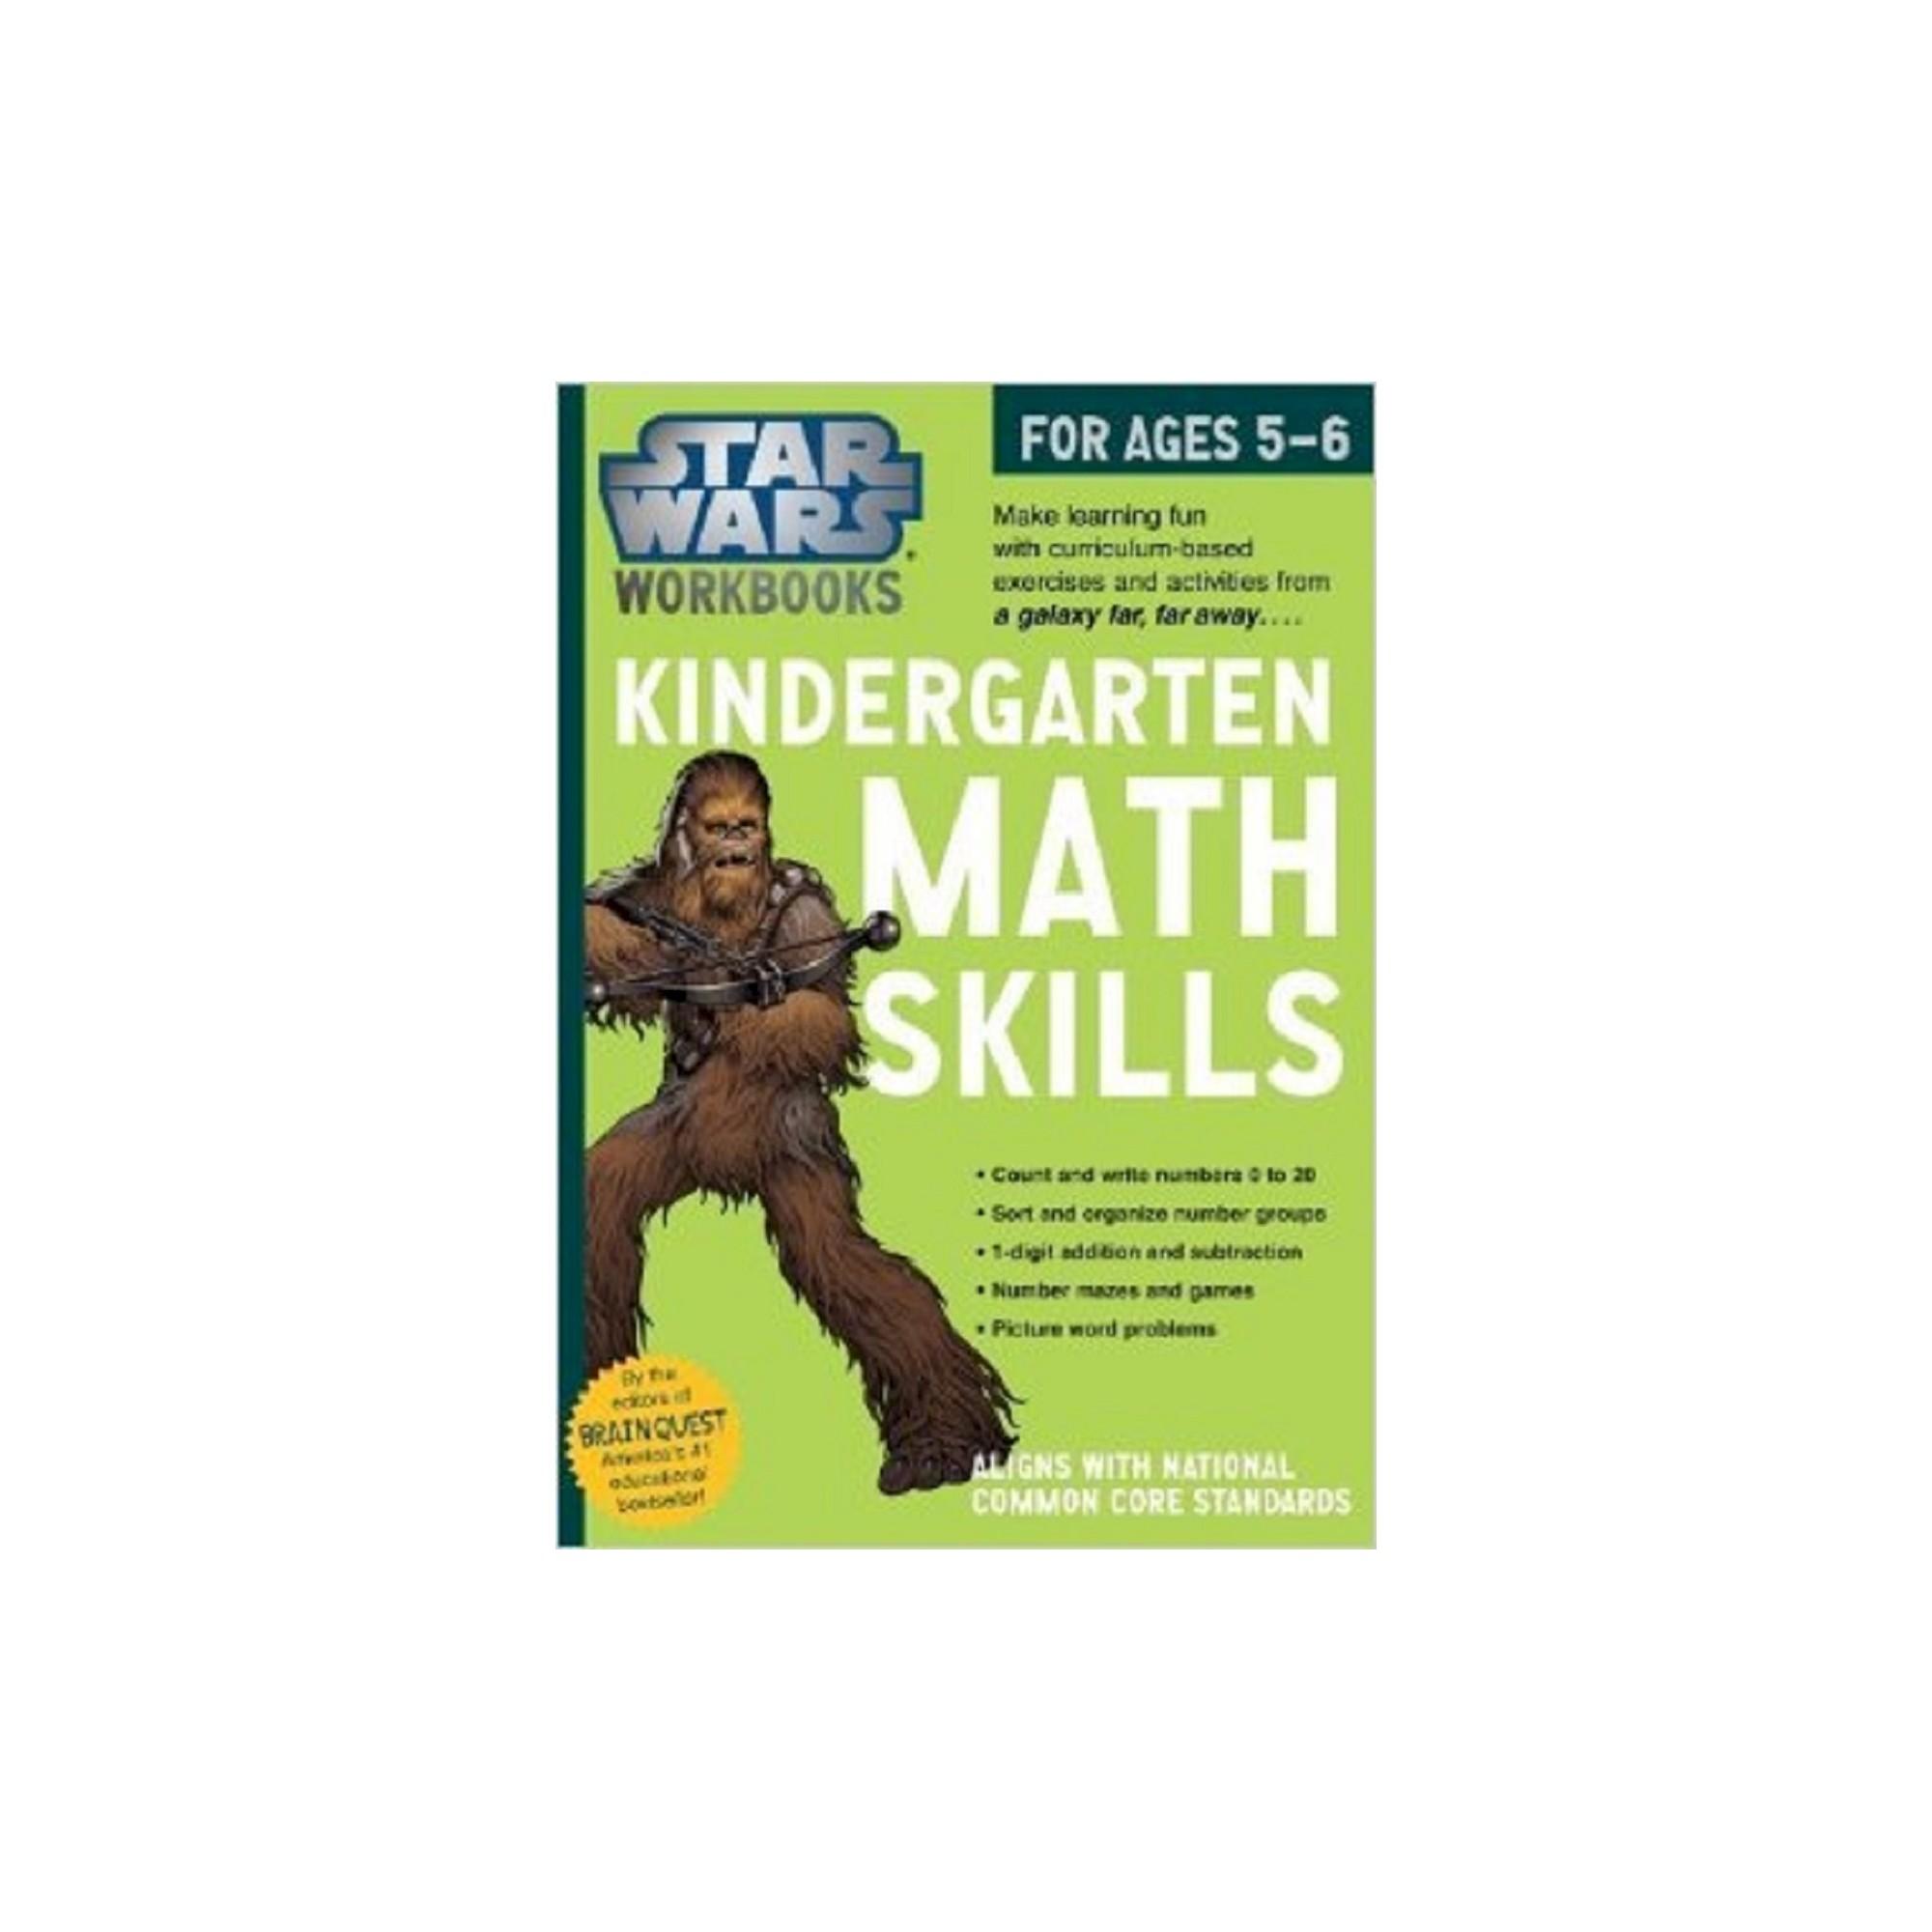 Star Wars Kindergarten Math Skills For Ages 5 6 By